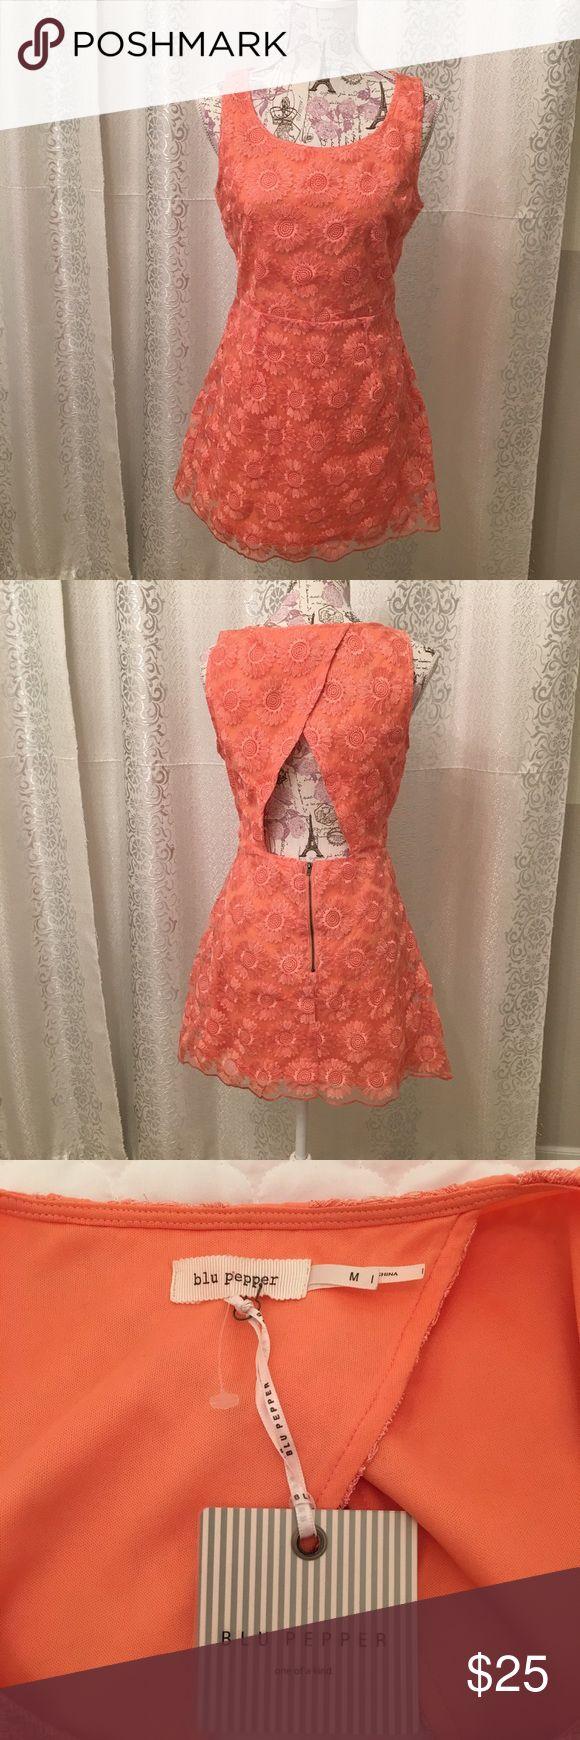 Brand new coral colored dress Brand new short dress. Blu Pepper Dresses Mini